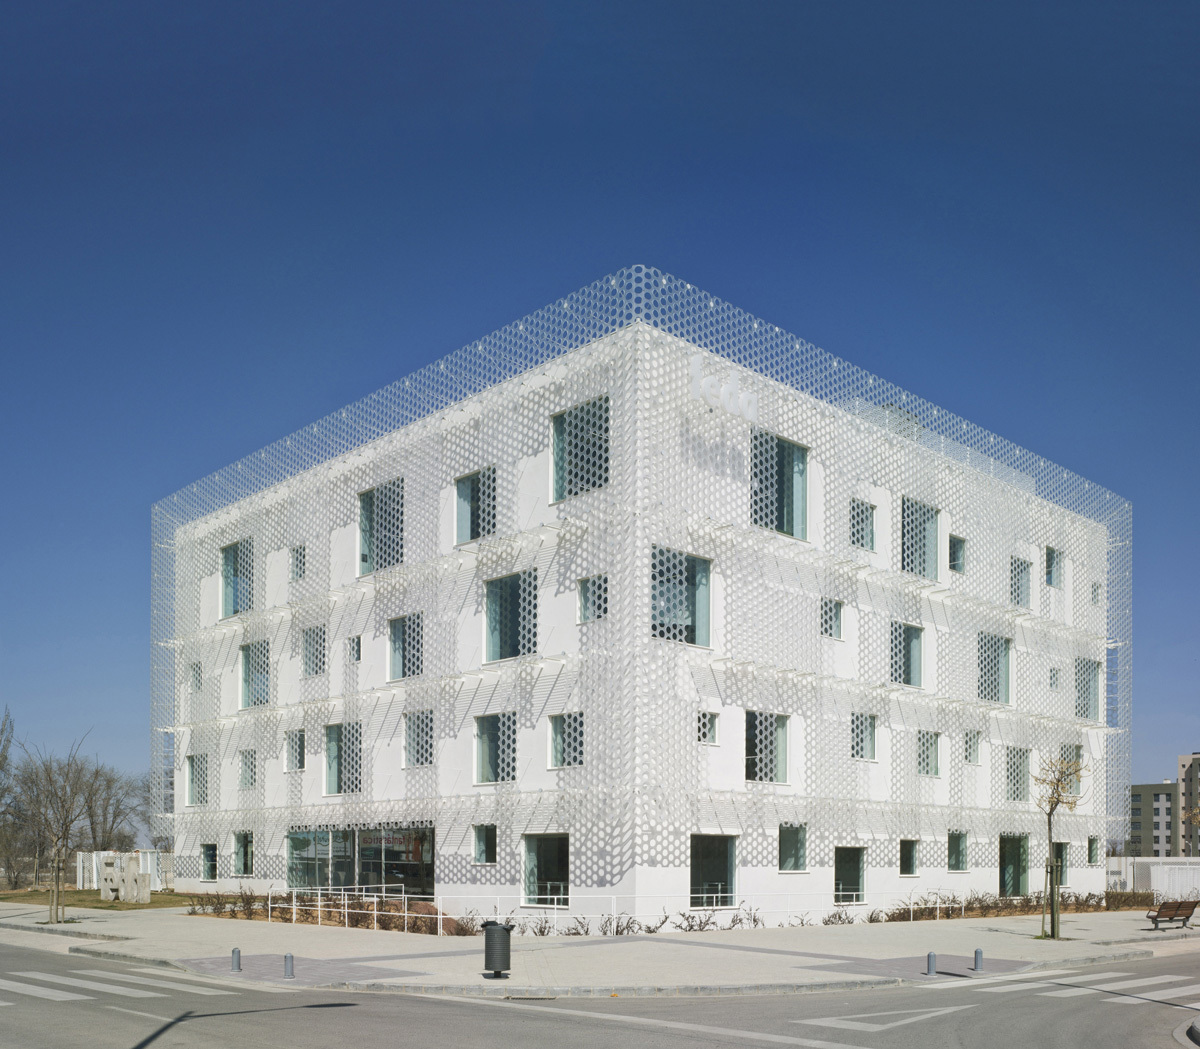 FEDA Confederation of Employers of Albacete Headquarters in Albacete, Spain by COR & asociados; Photo: David Frutos